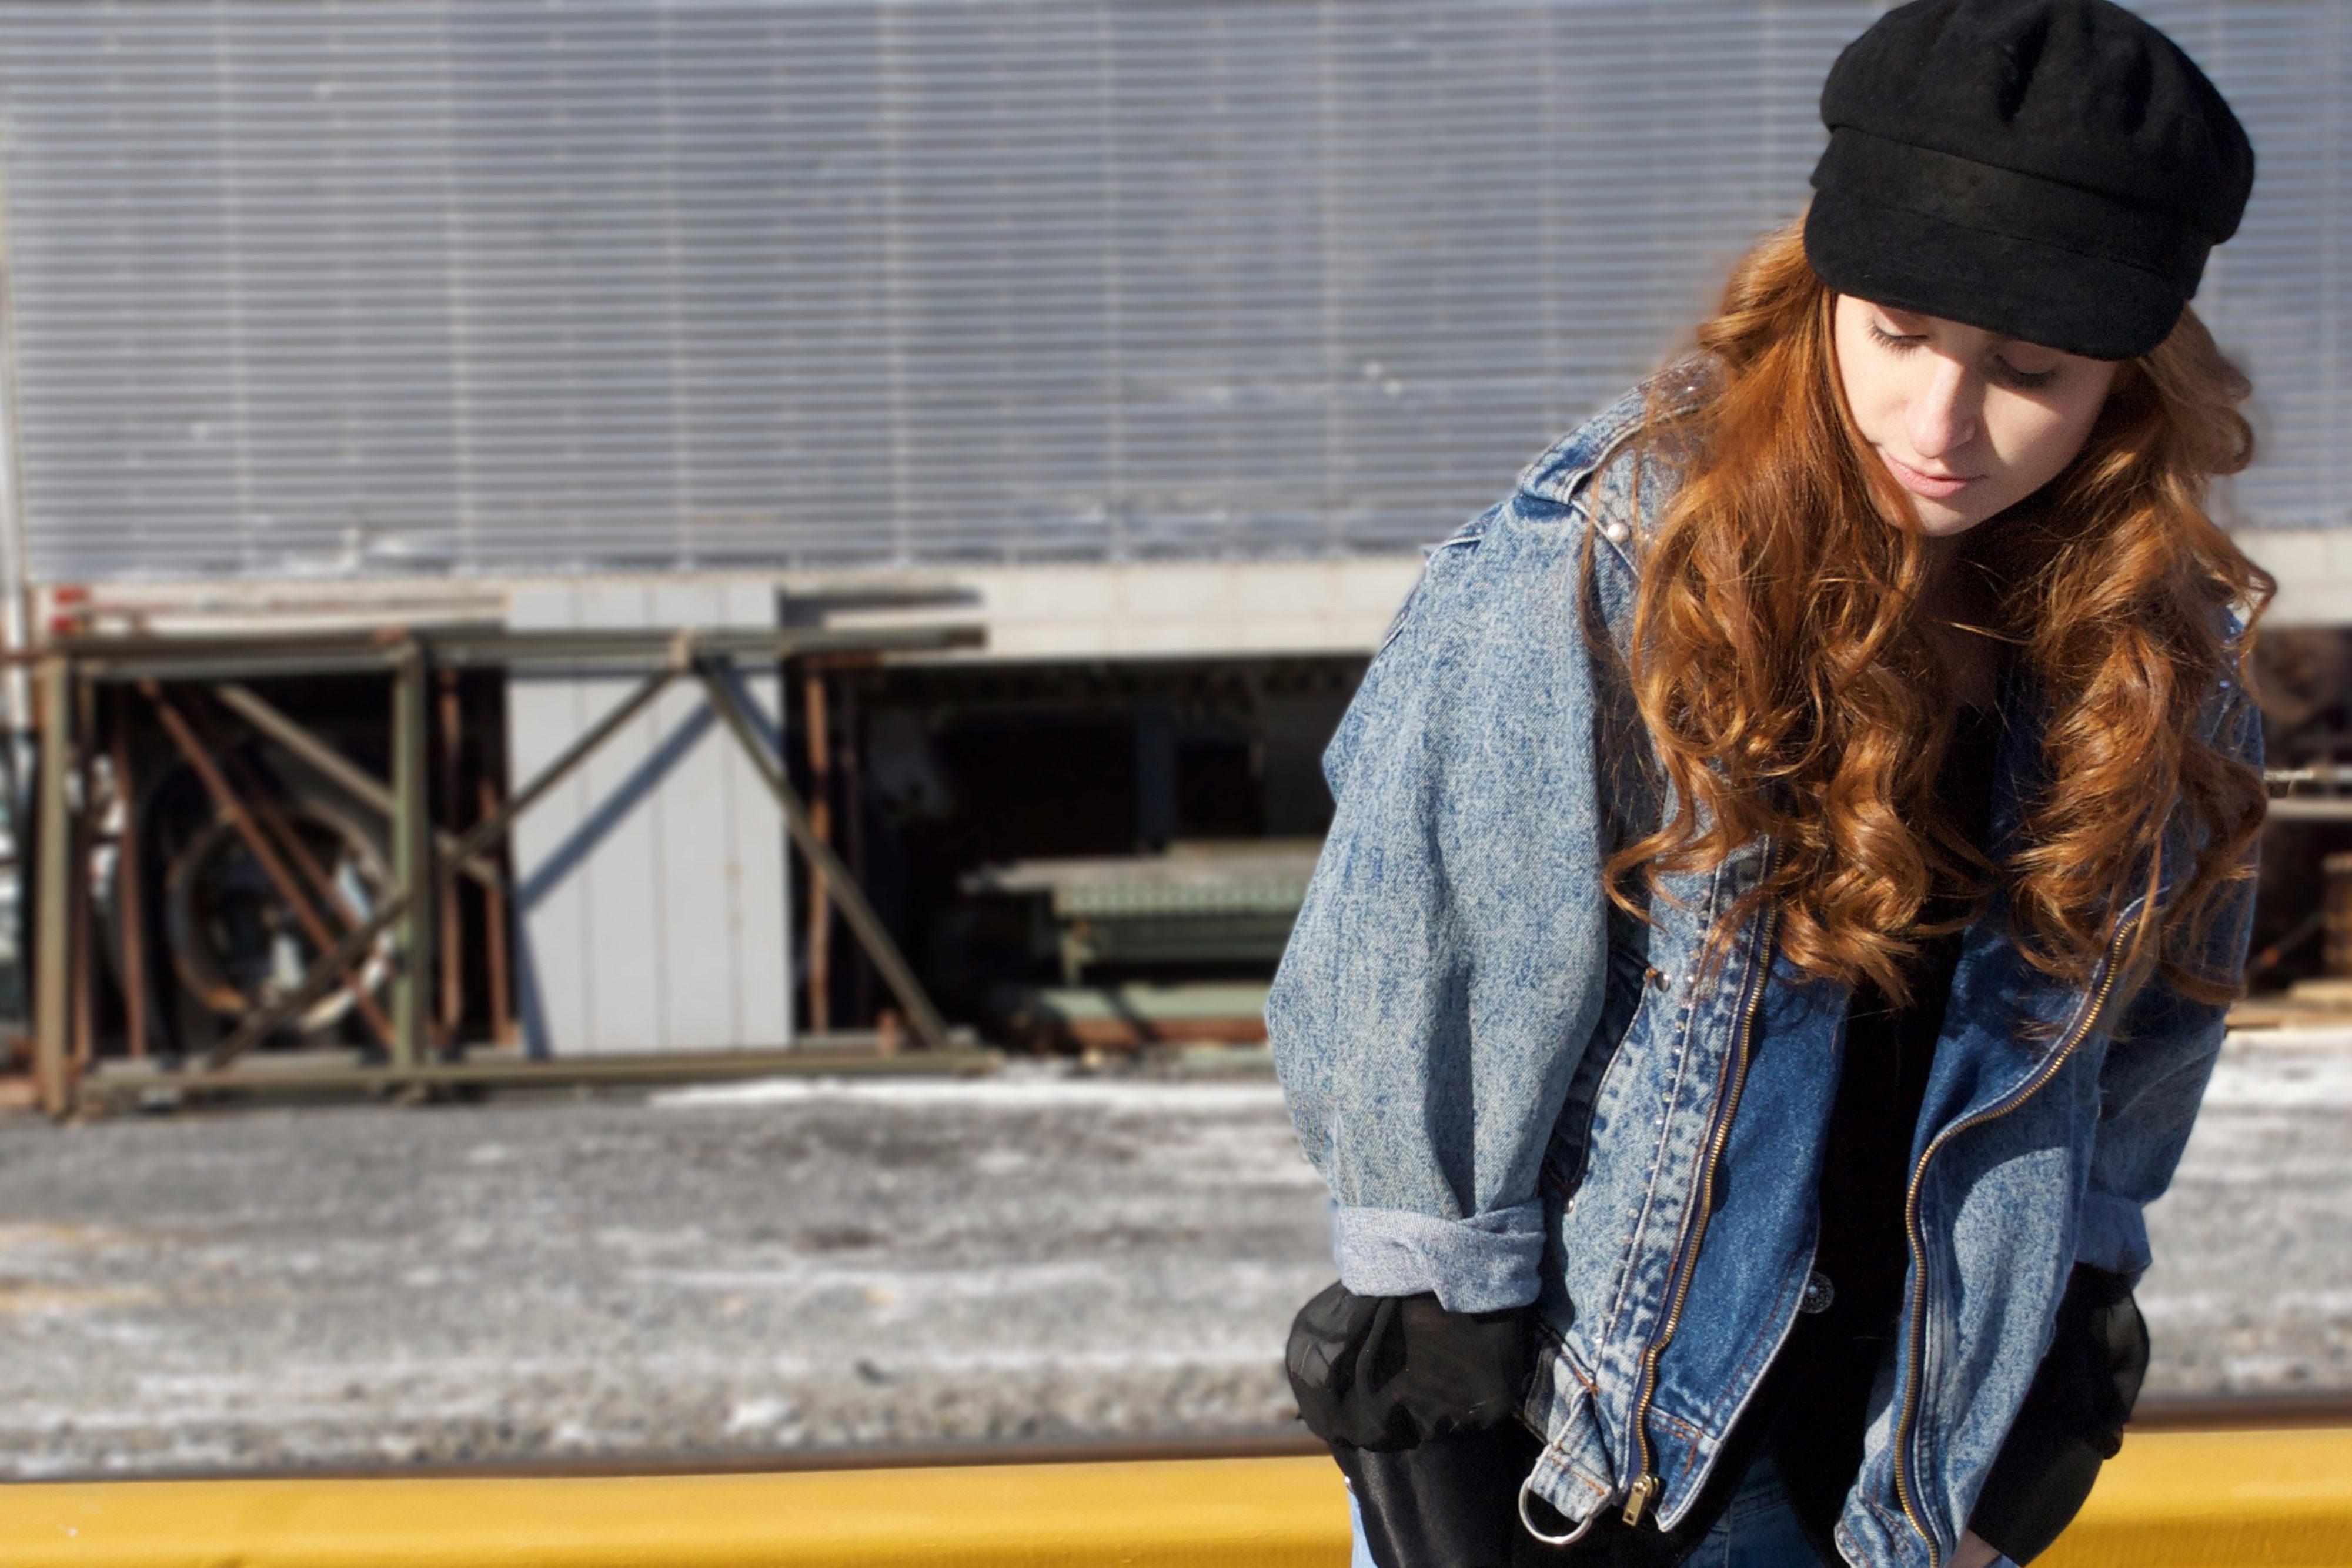 Redhead girl in denim by traintracks looking down